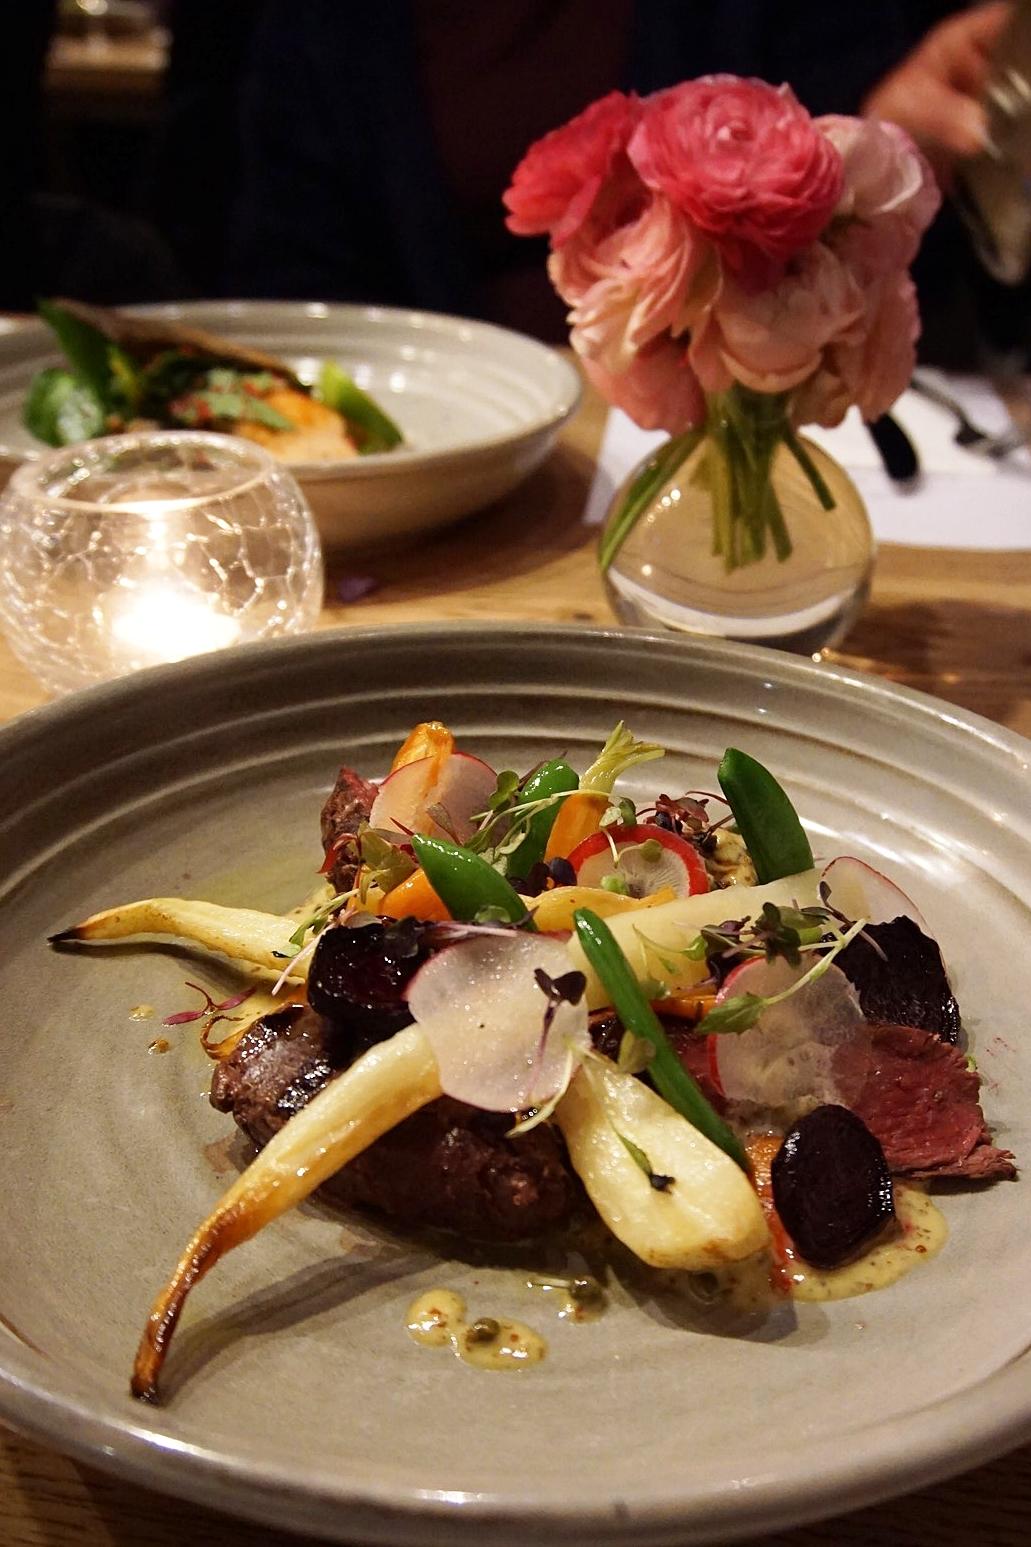 Kangaroo fillet chargrilled, roasted beets, parsnips, baby carrots, horseradish & mustard relish medium rare (gf)